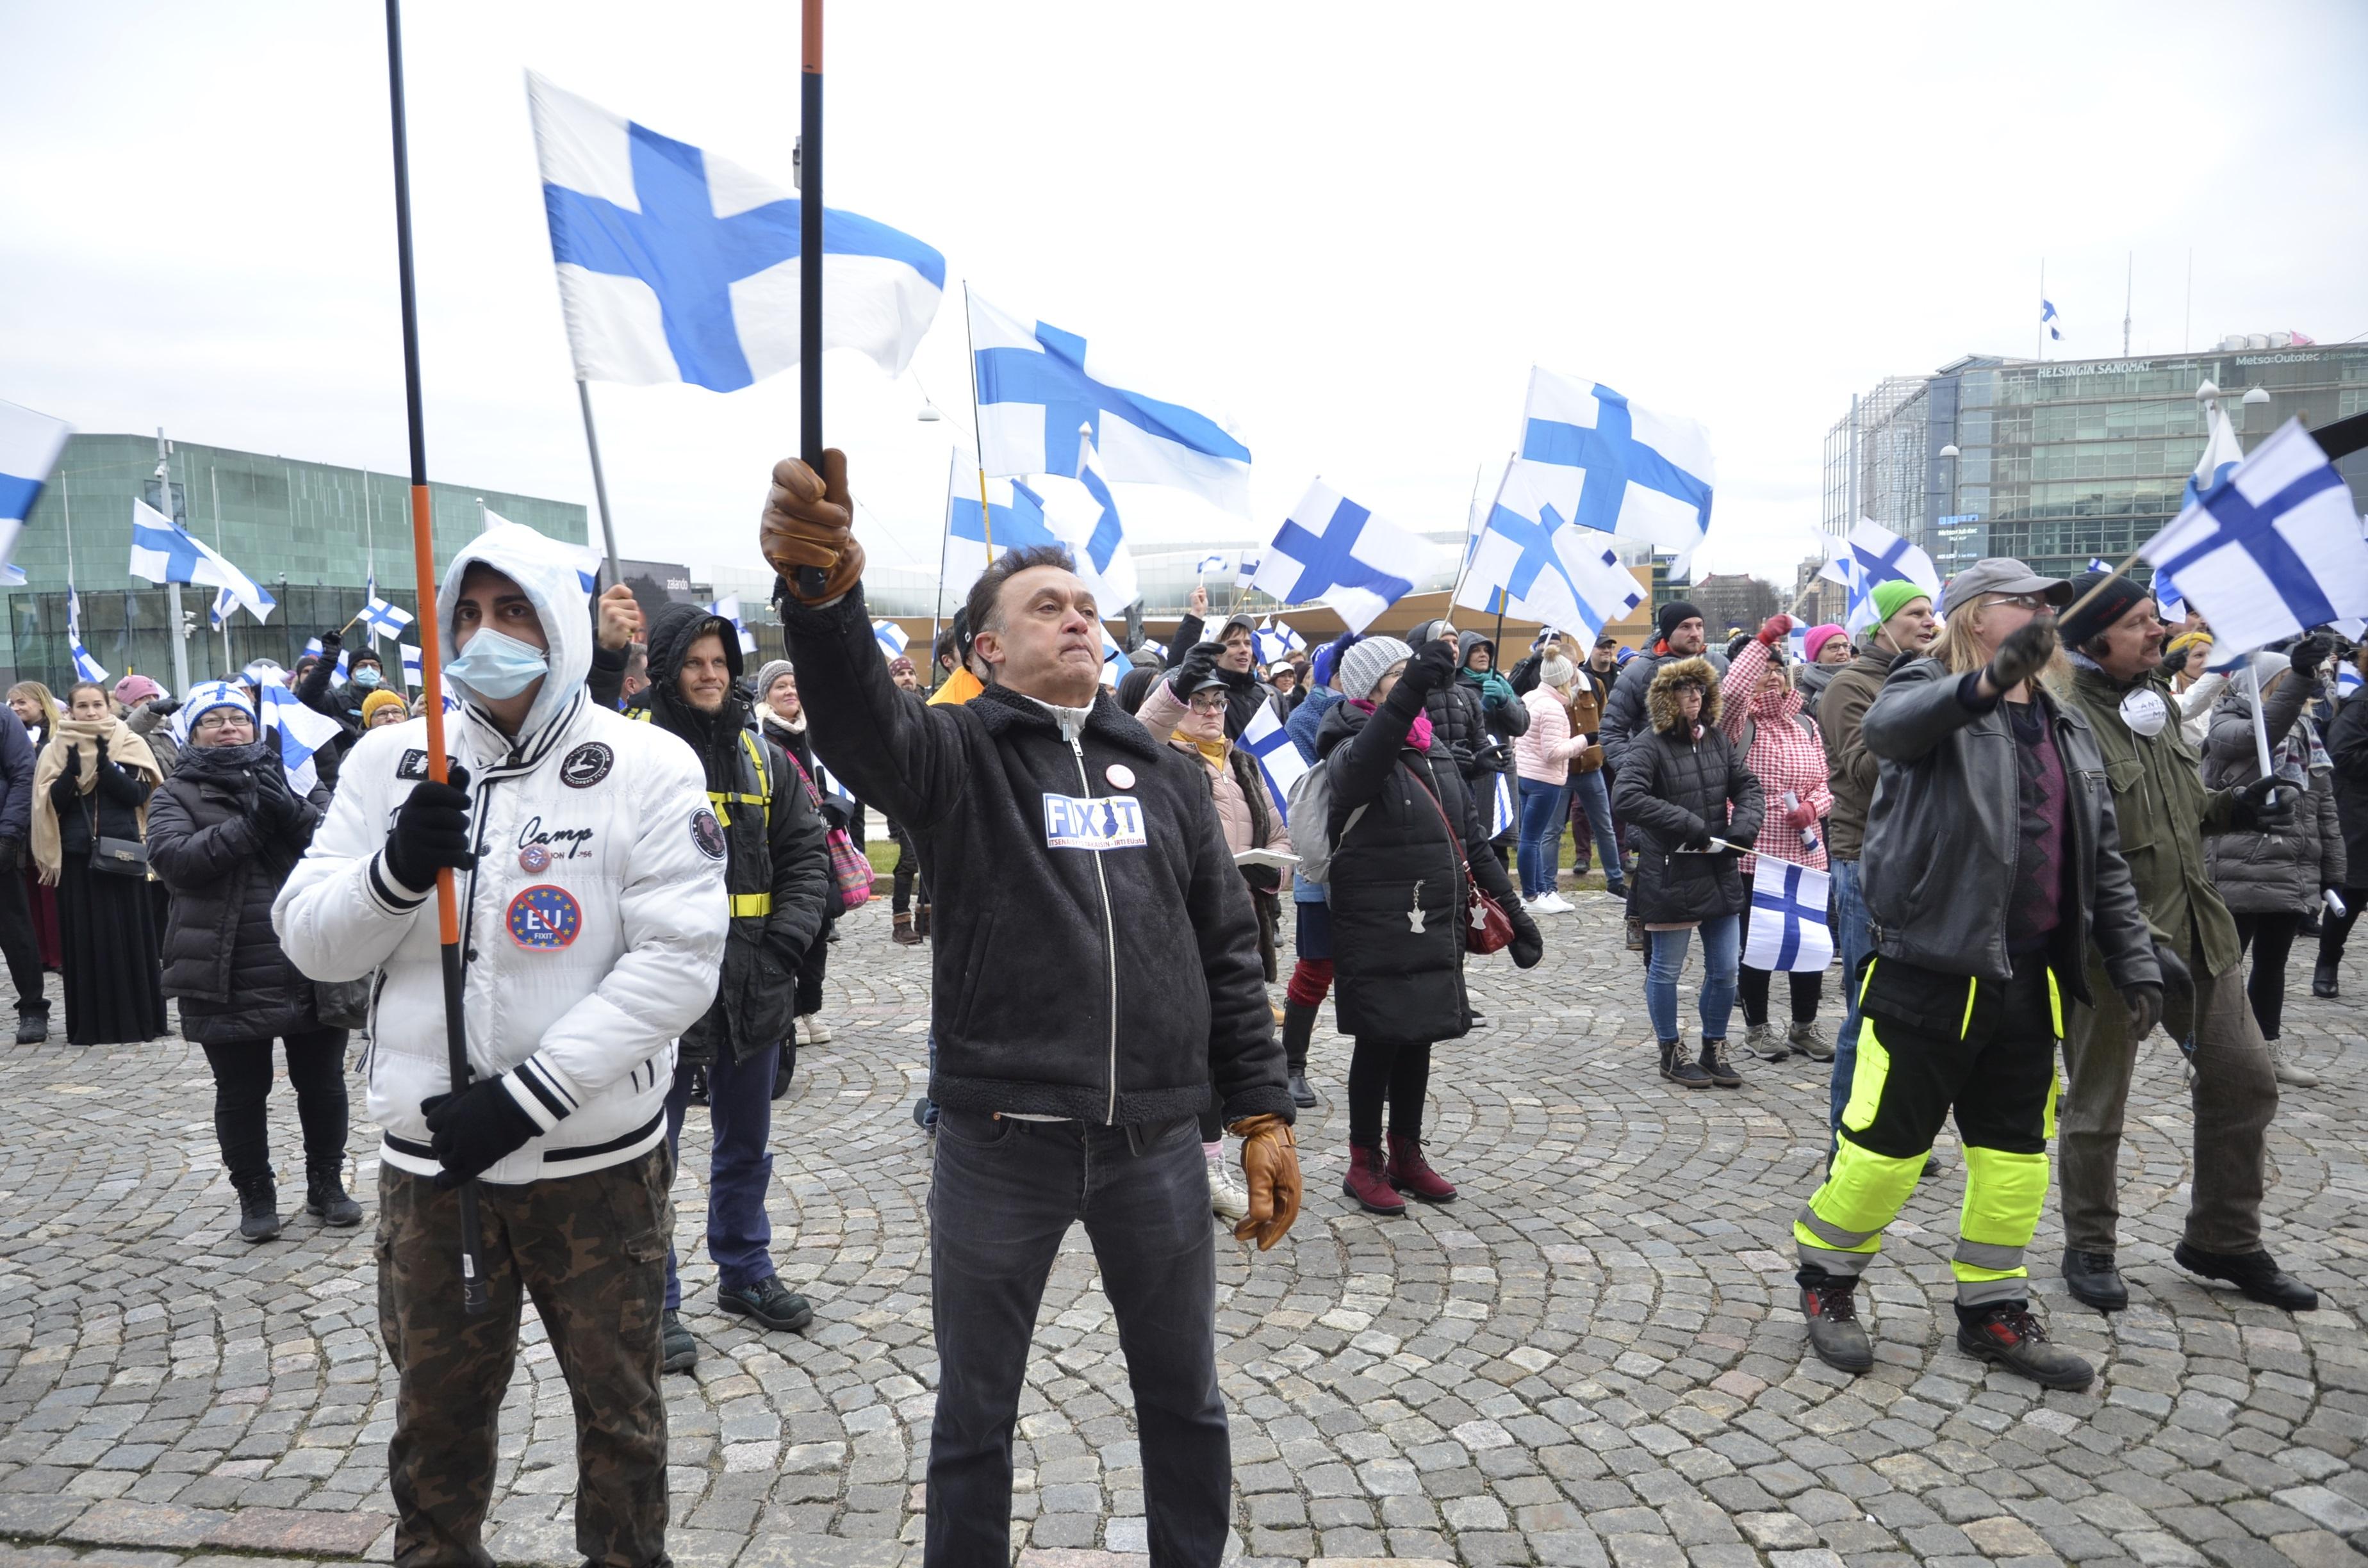 seura.fi